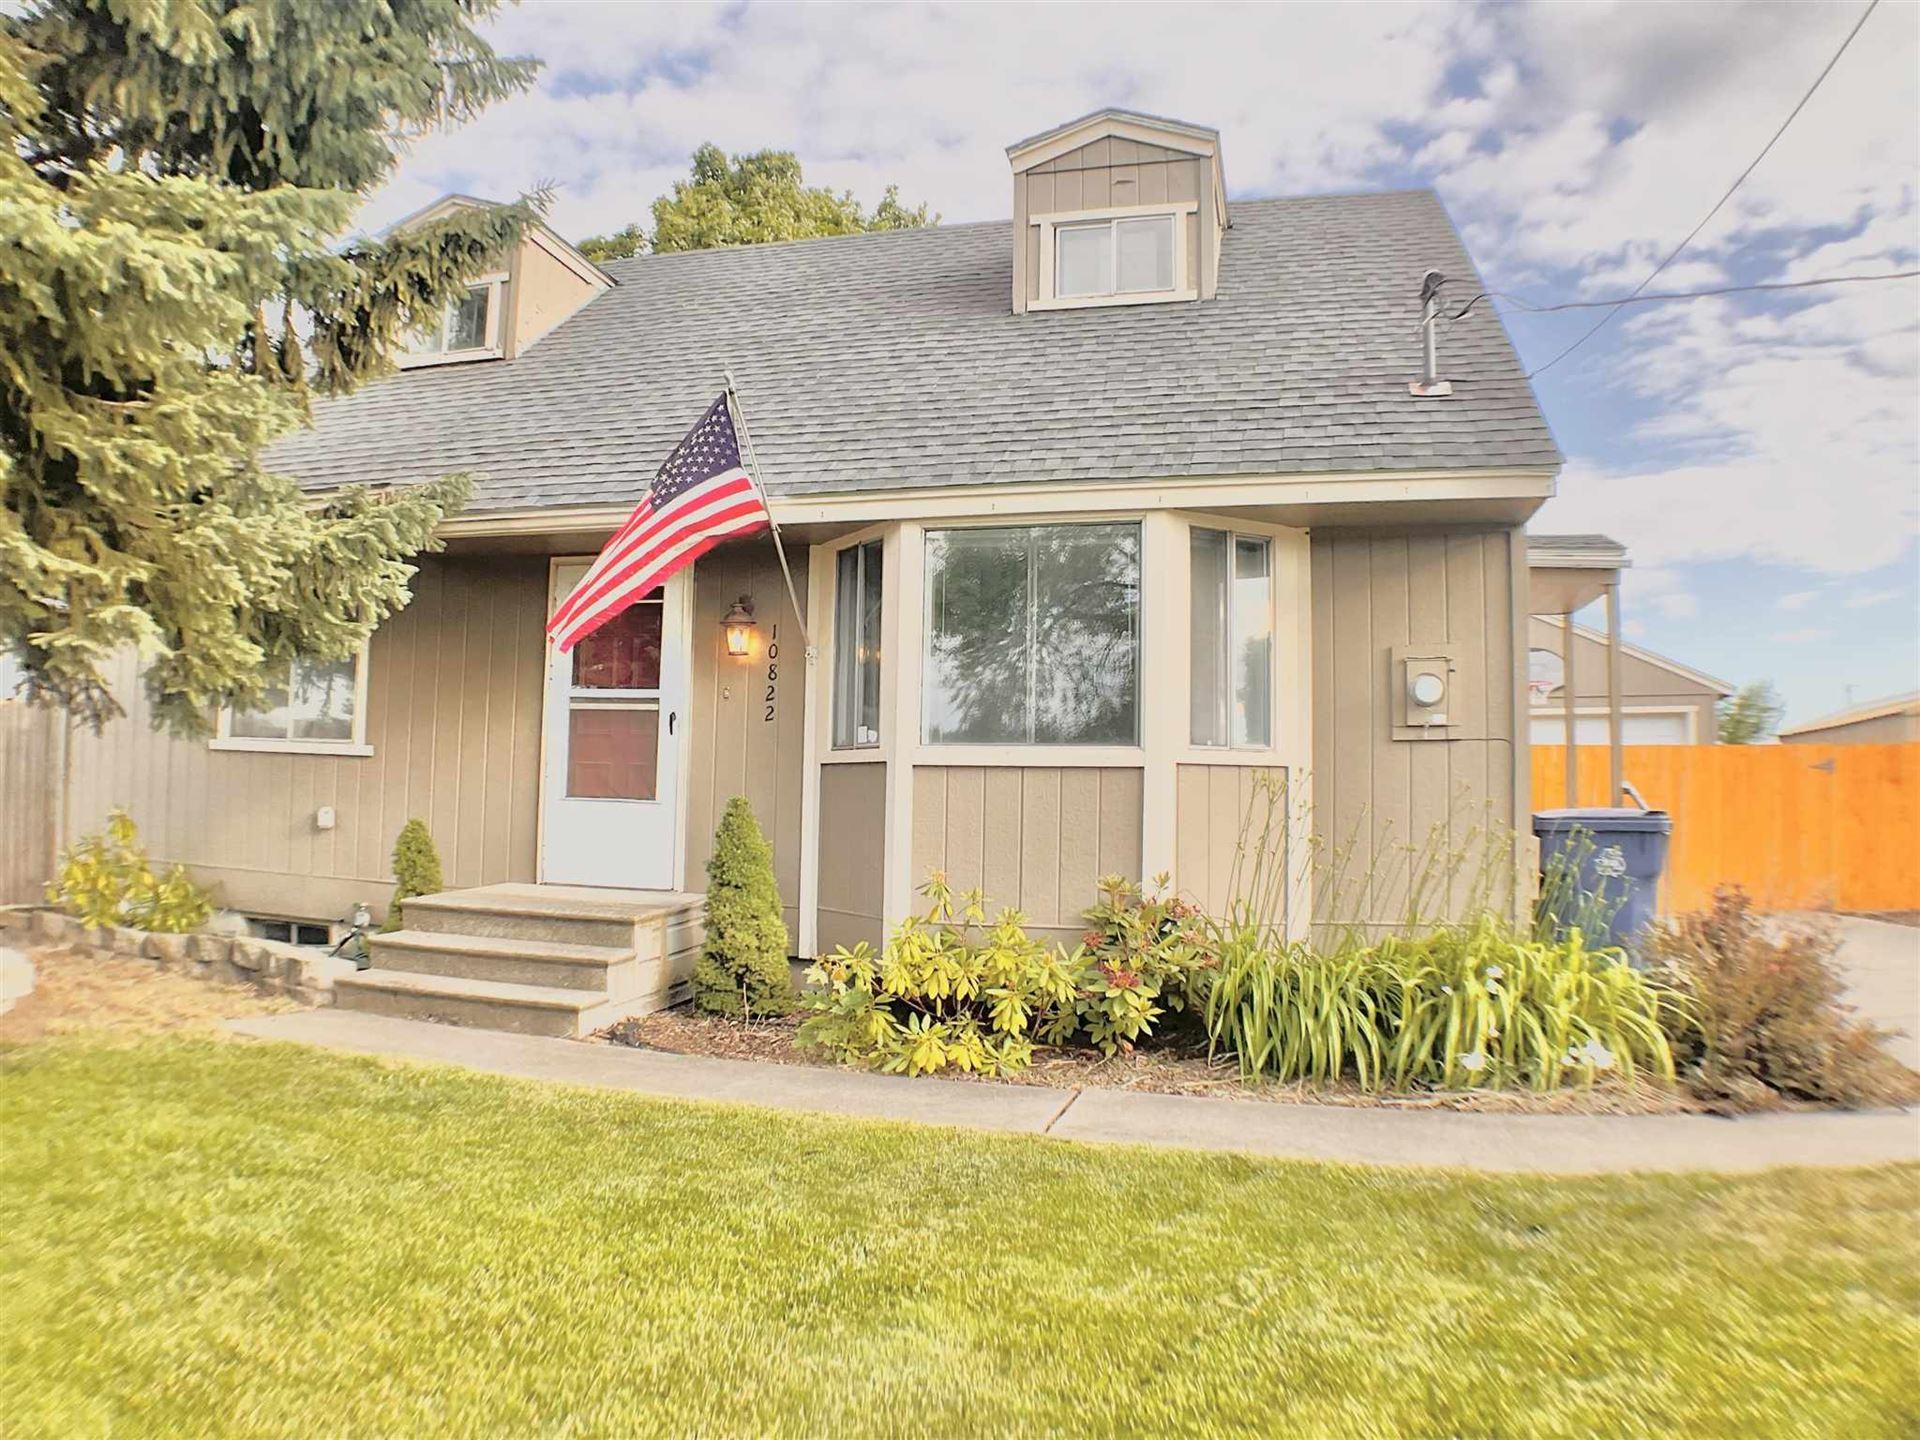 10822 E Fairview Ave, Spokane Valley, WA 99206-2601 - #: 202118698